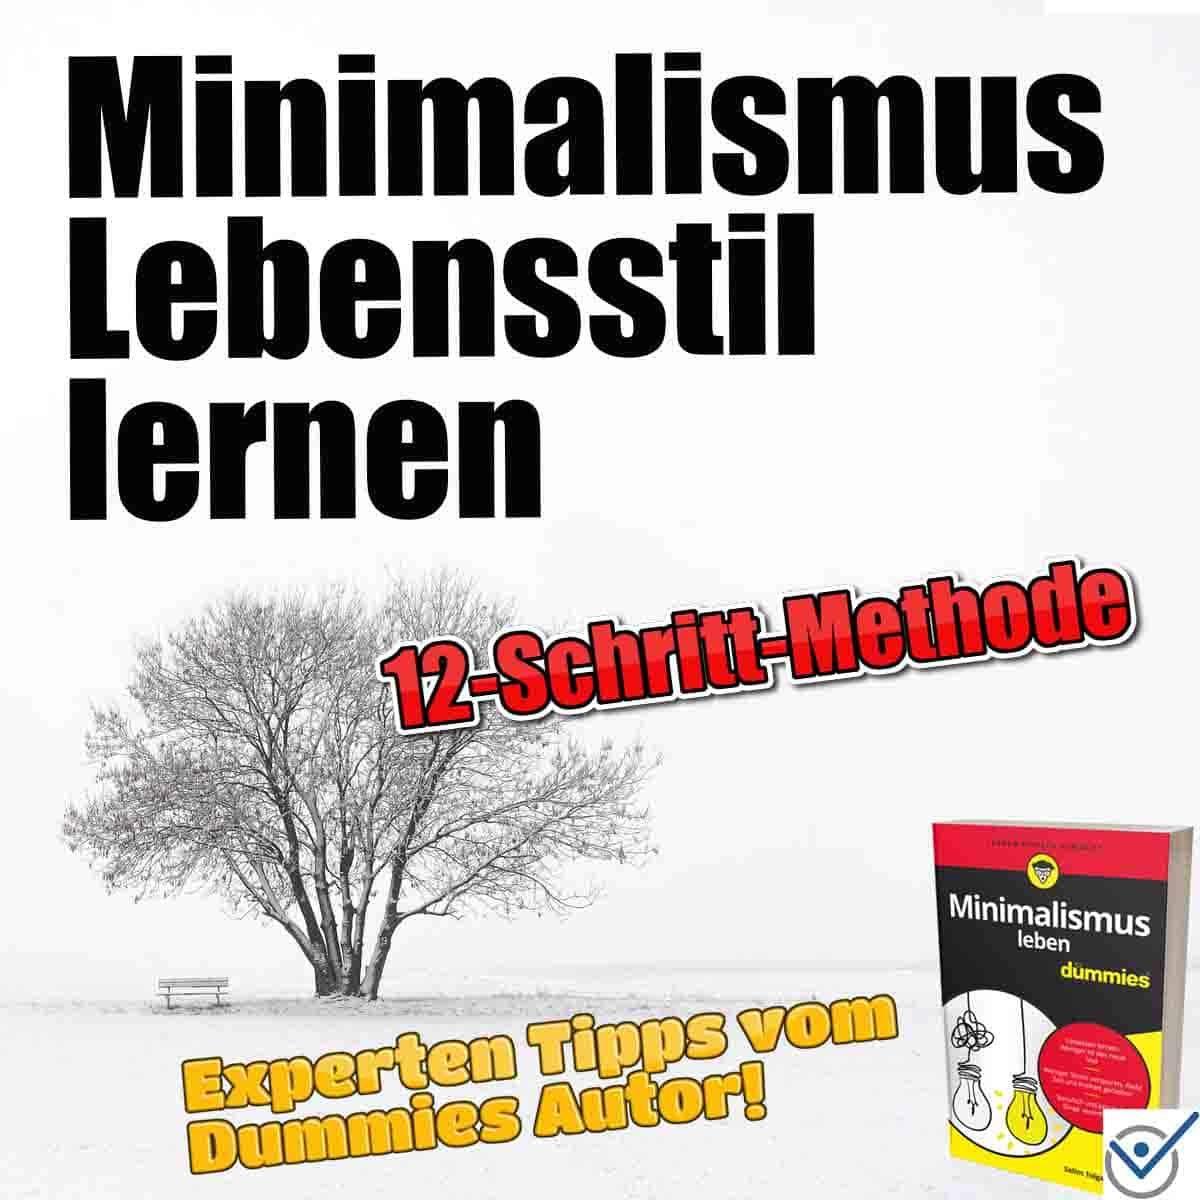 Minimalismus Lebensstil lernen